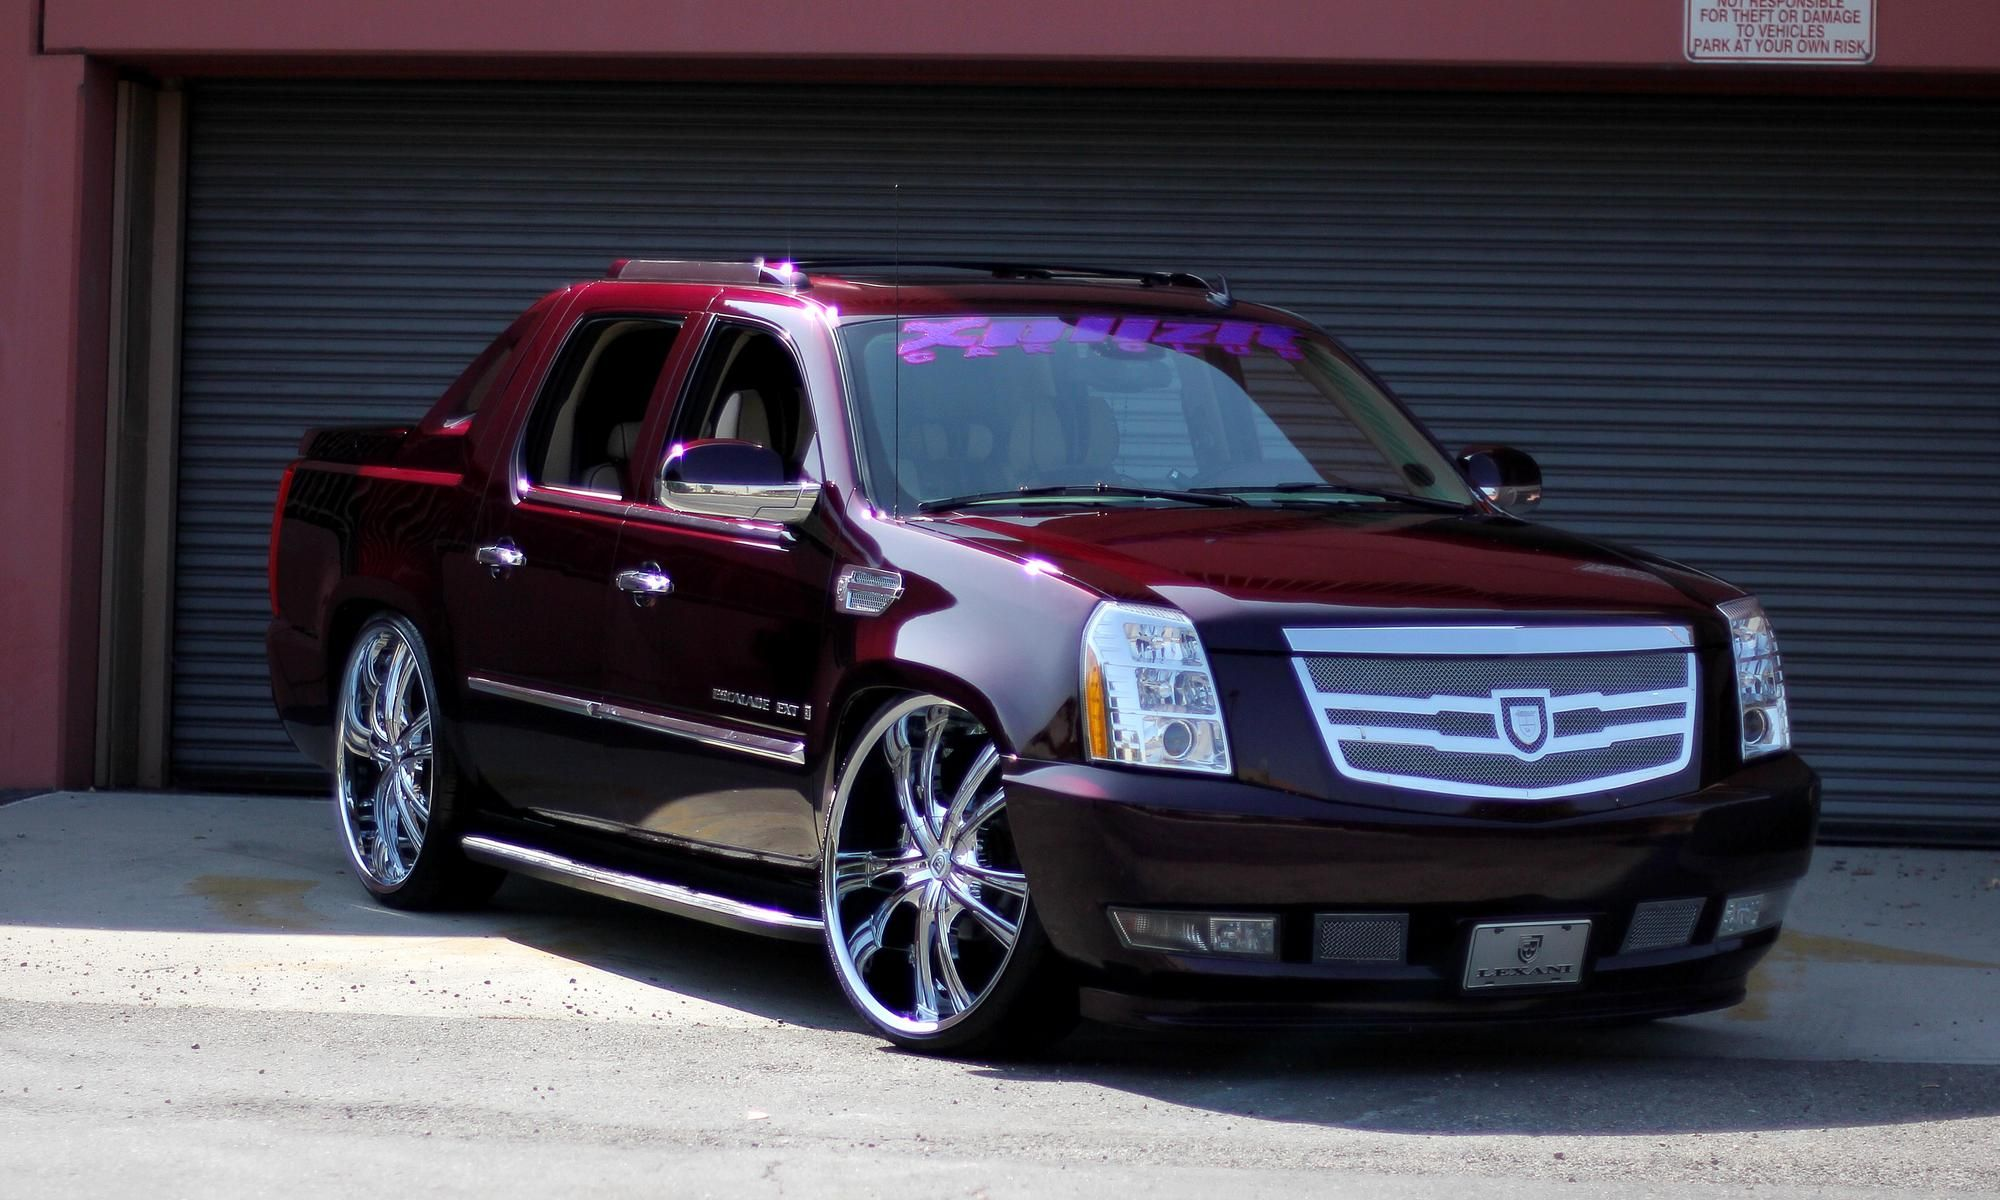 Cadillac srx 2017 hd wallpapers 1 cadillacsrx2017hdwallpapers cadillacsrx2017 cadillacsrx cadillac cars wallpapers cars wallpapers pinterest